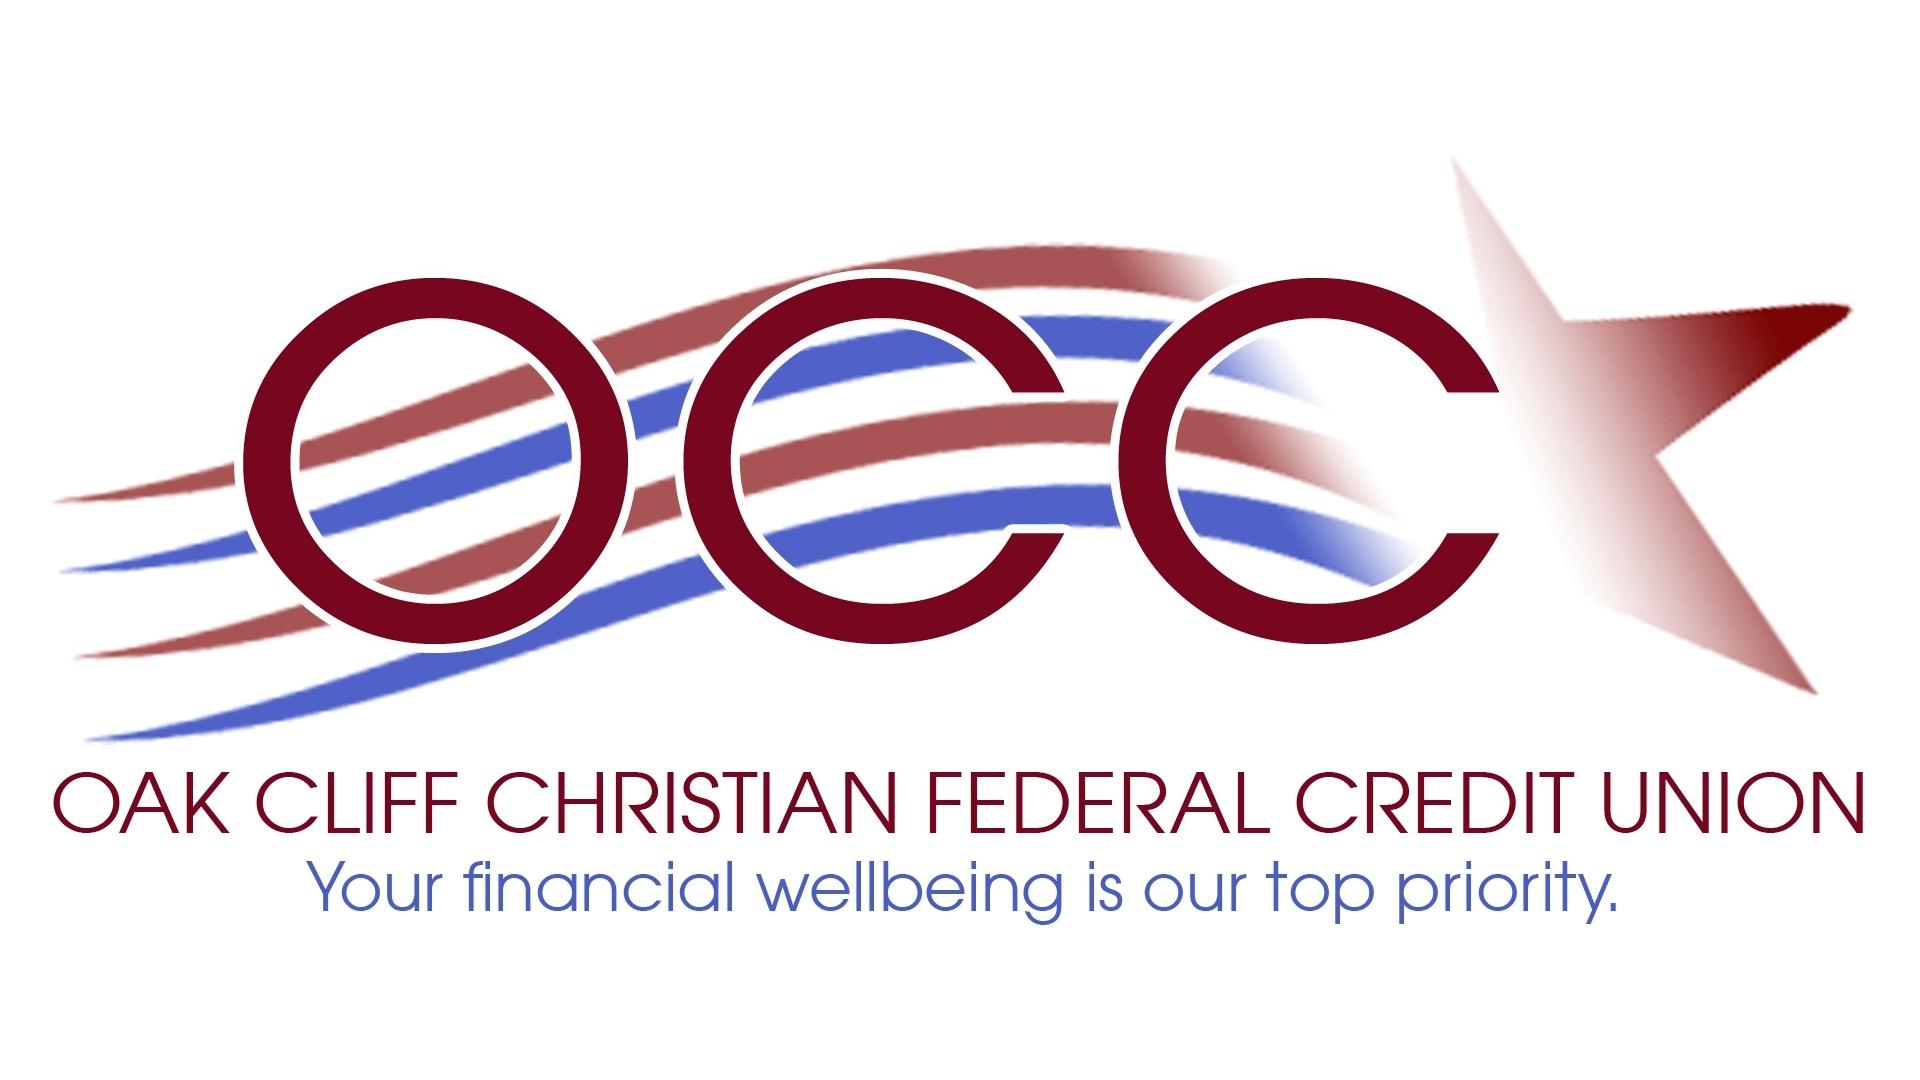 Oak Cliff Christian Federal Credit Union